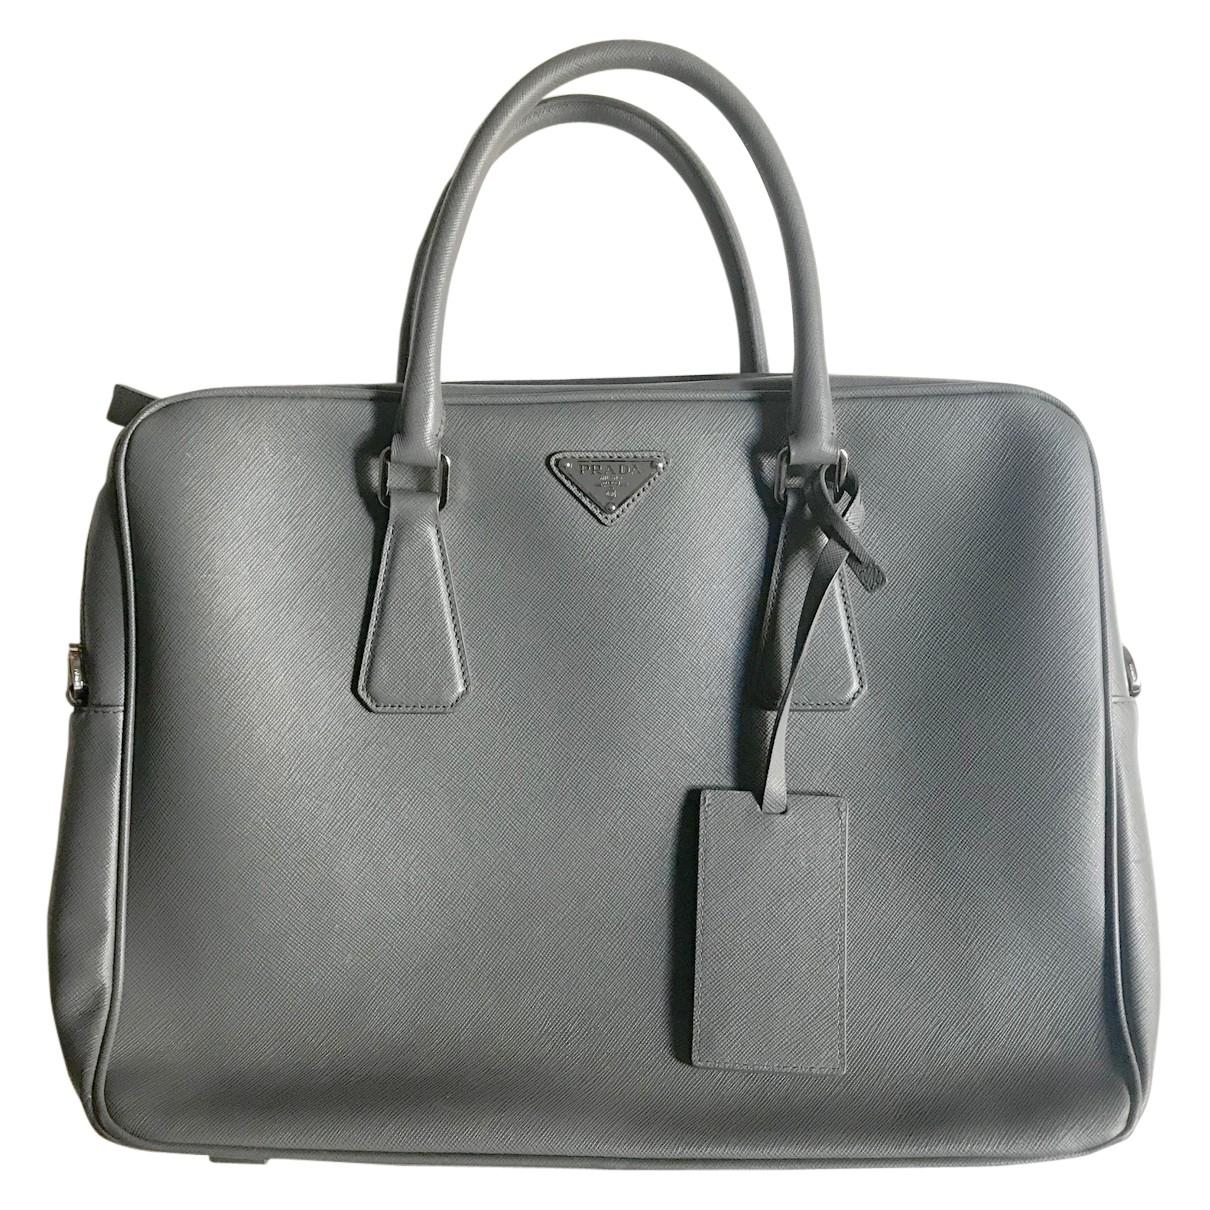 Prada N Anthracite Leather bag for Men N